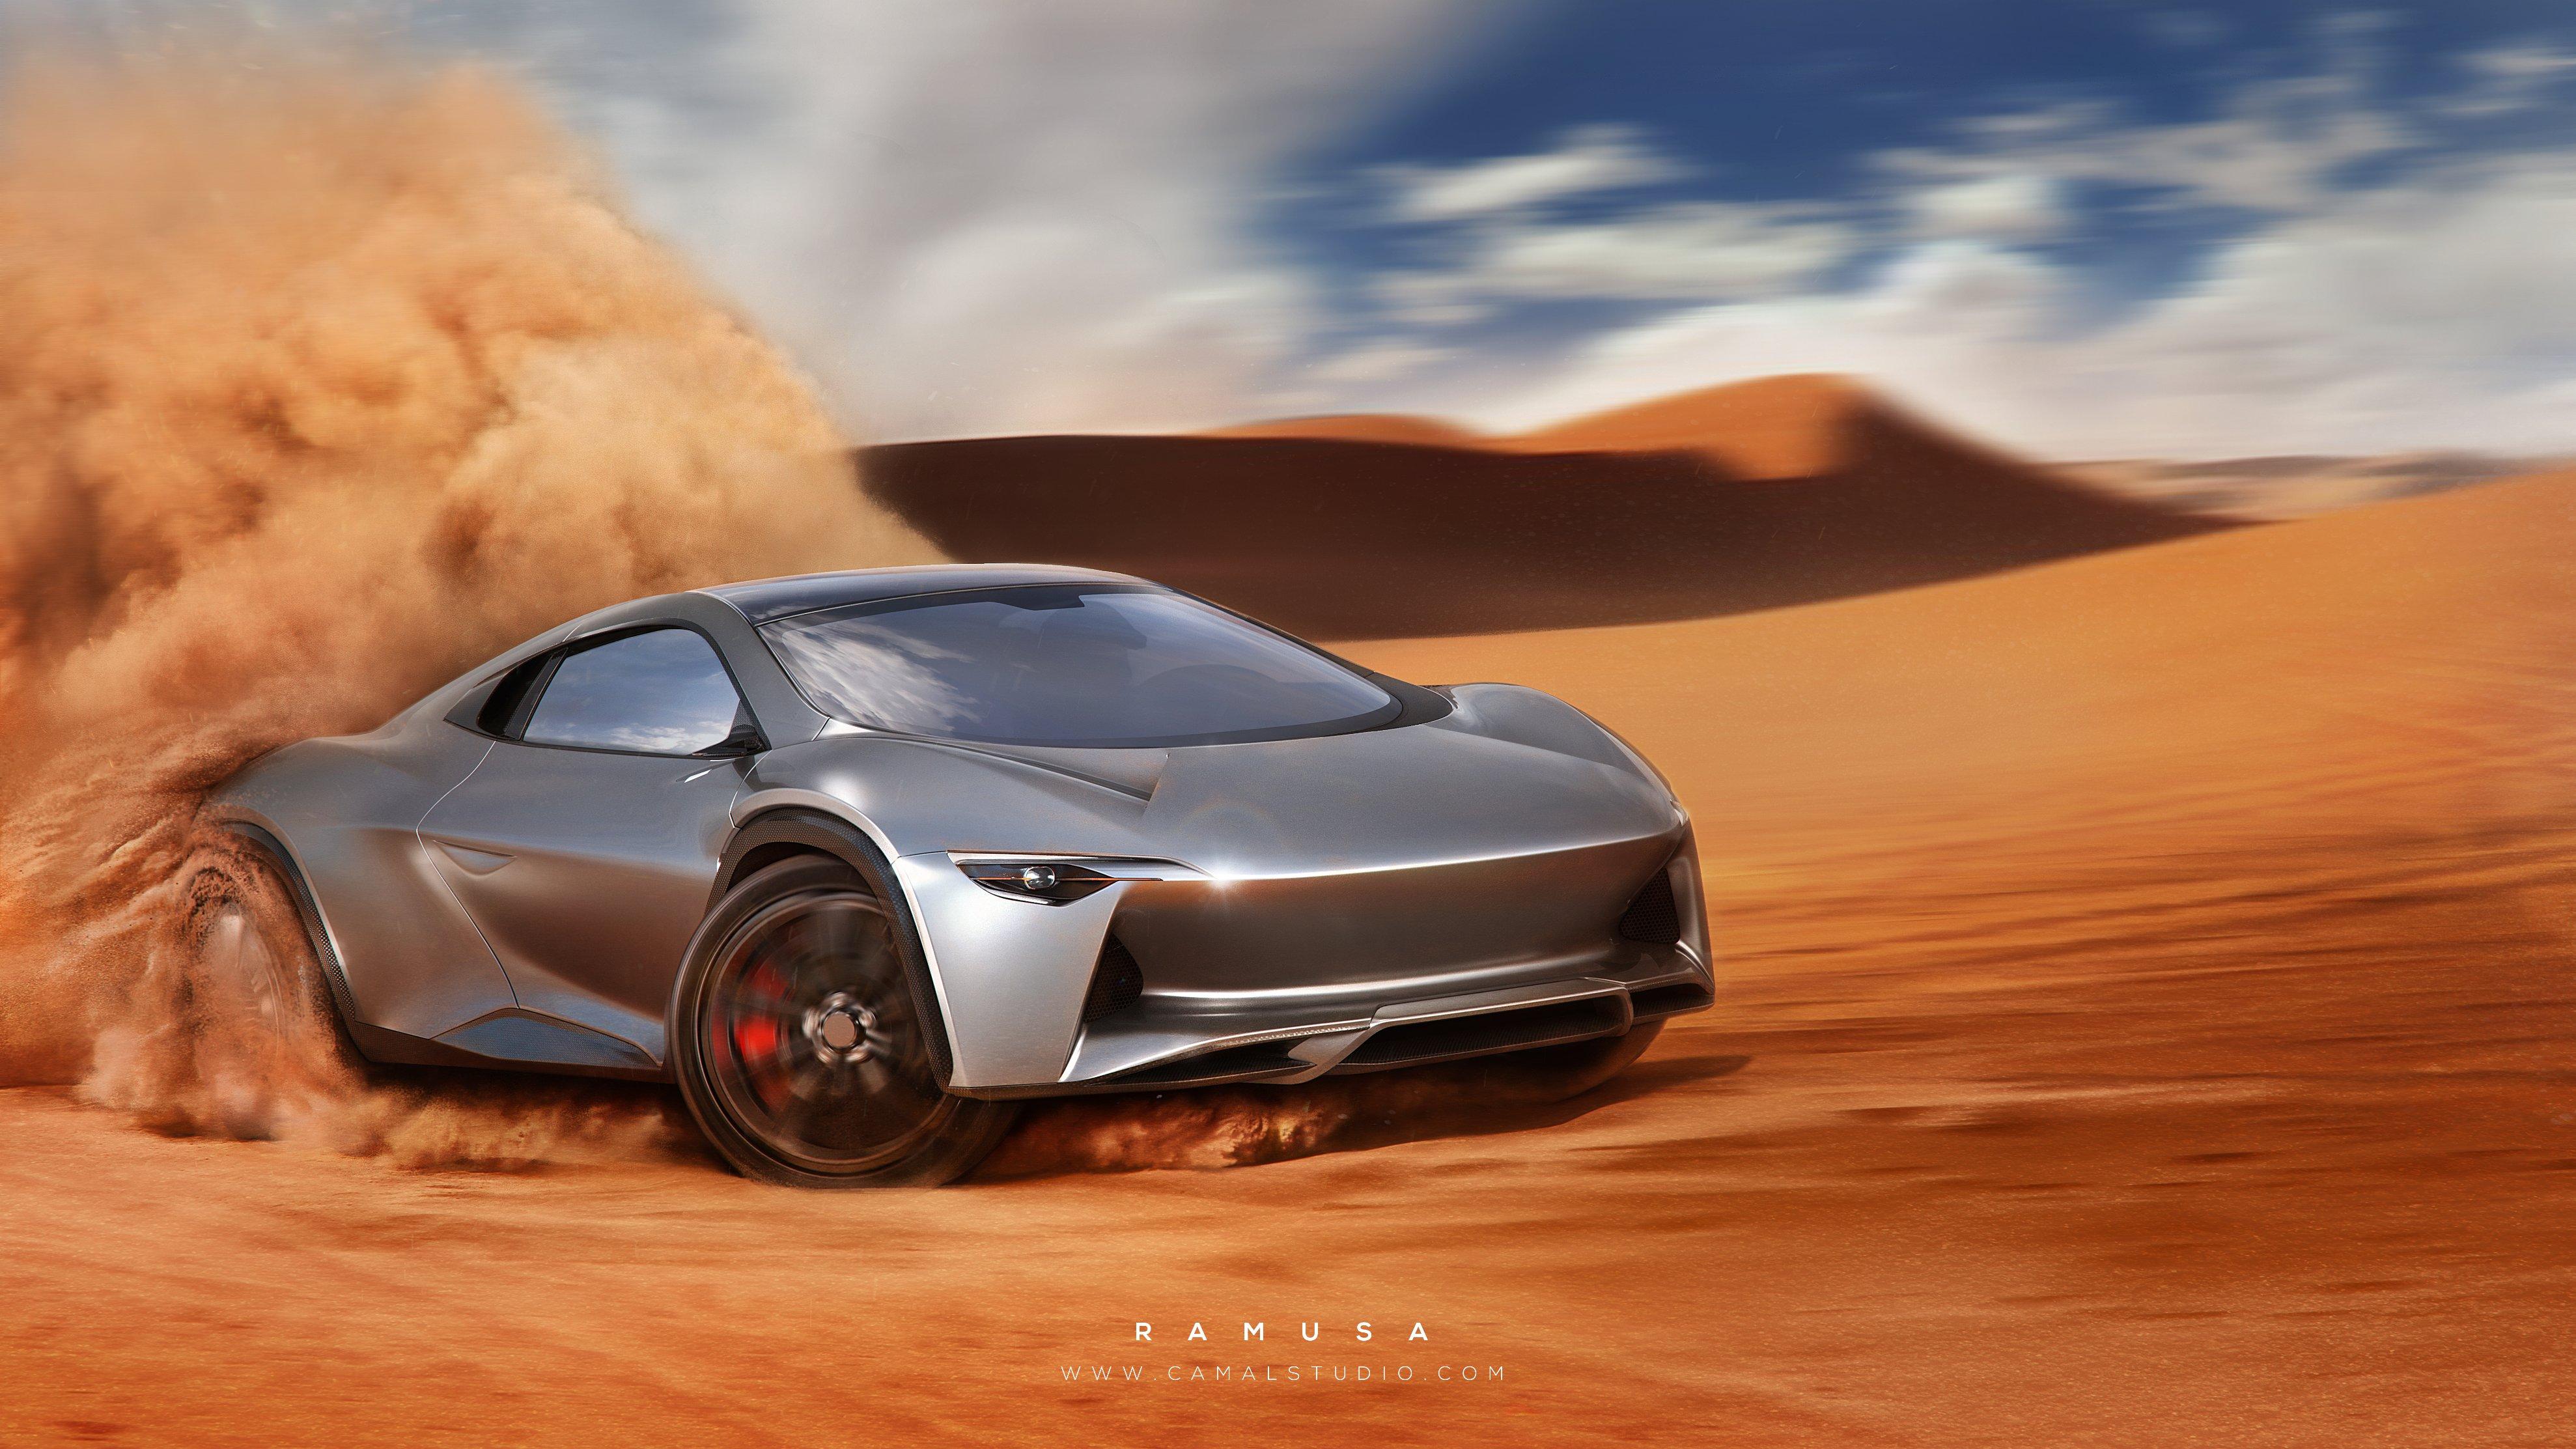 Sandracer GT Enter The Dune Bashing Supercar CNN Style - Supercar